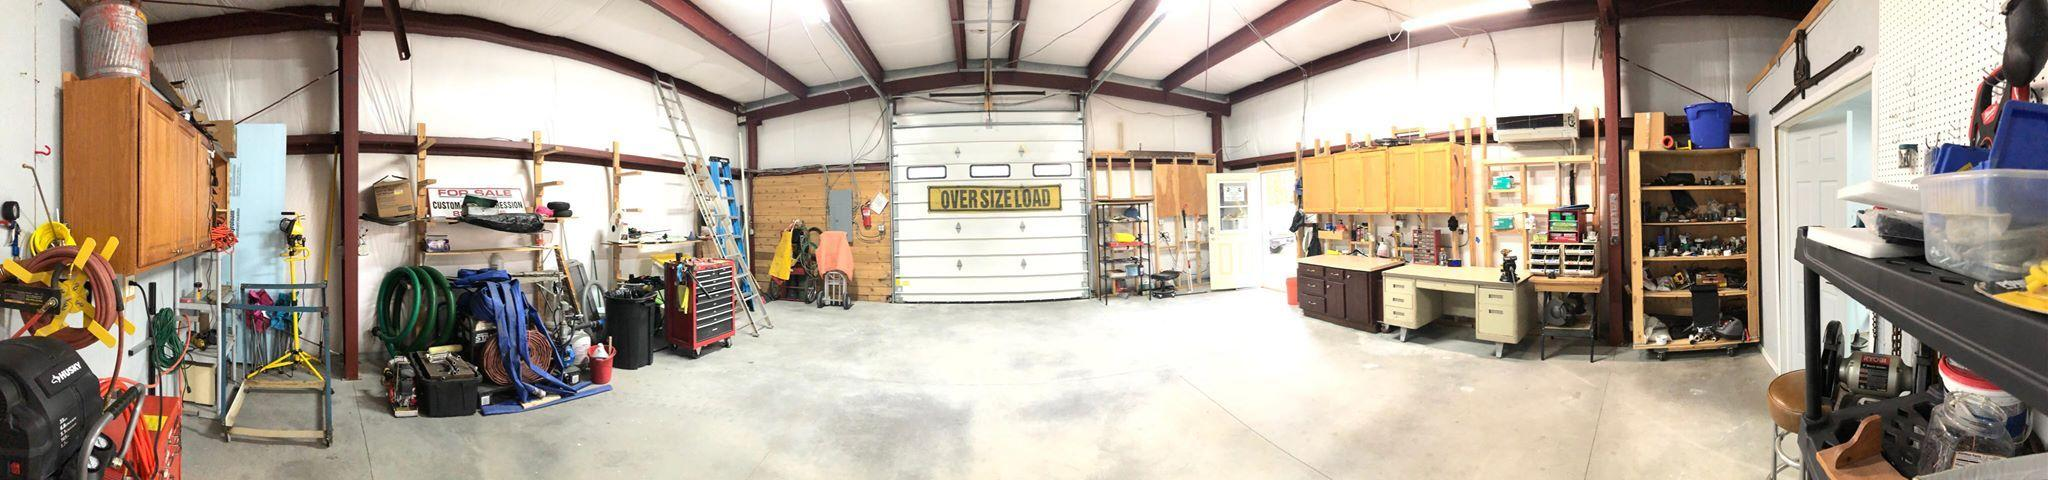 new shop pic 2